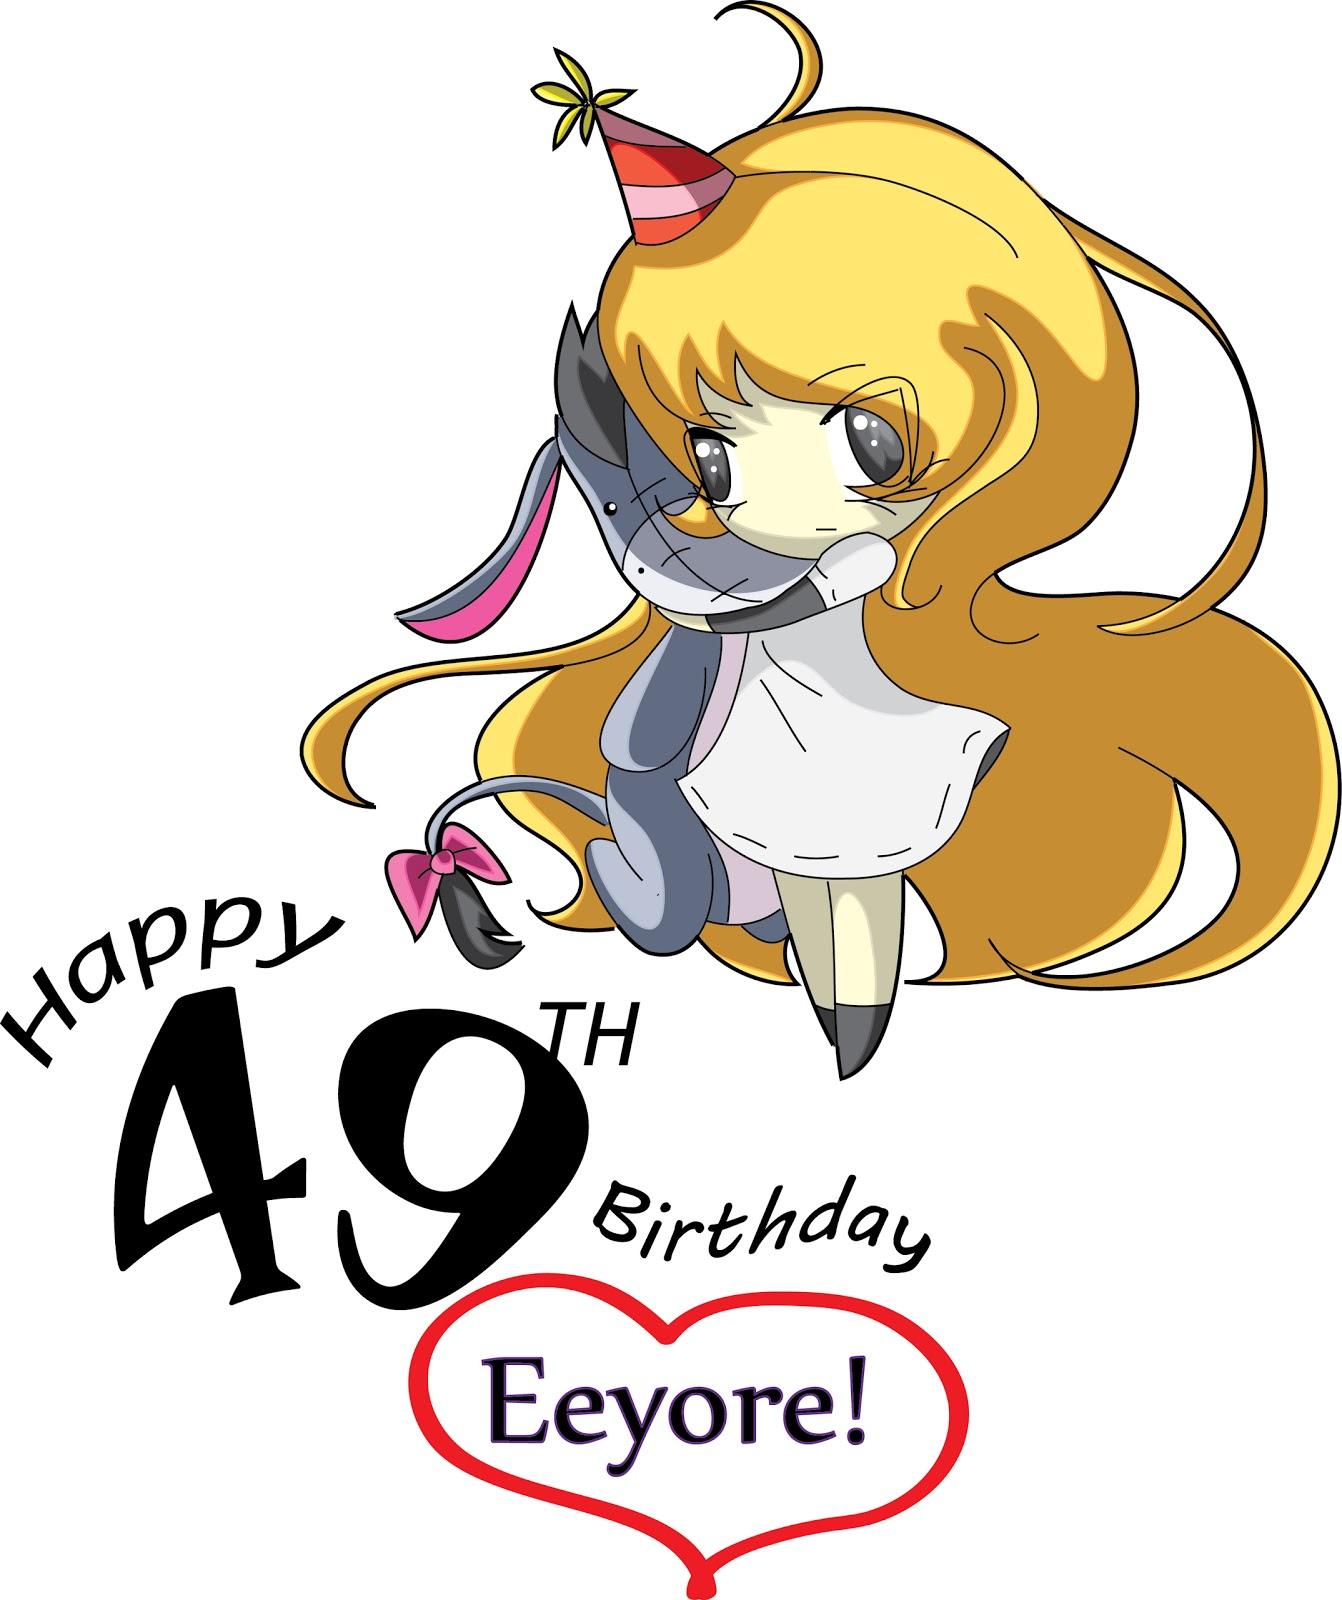 Kosmic Kat: ~Happy Birthday 49th Eeyore!~